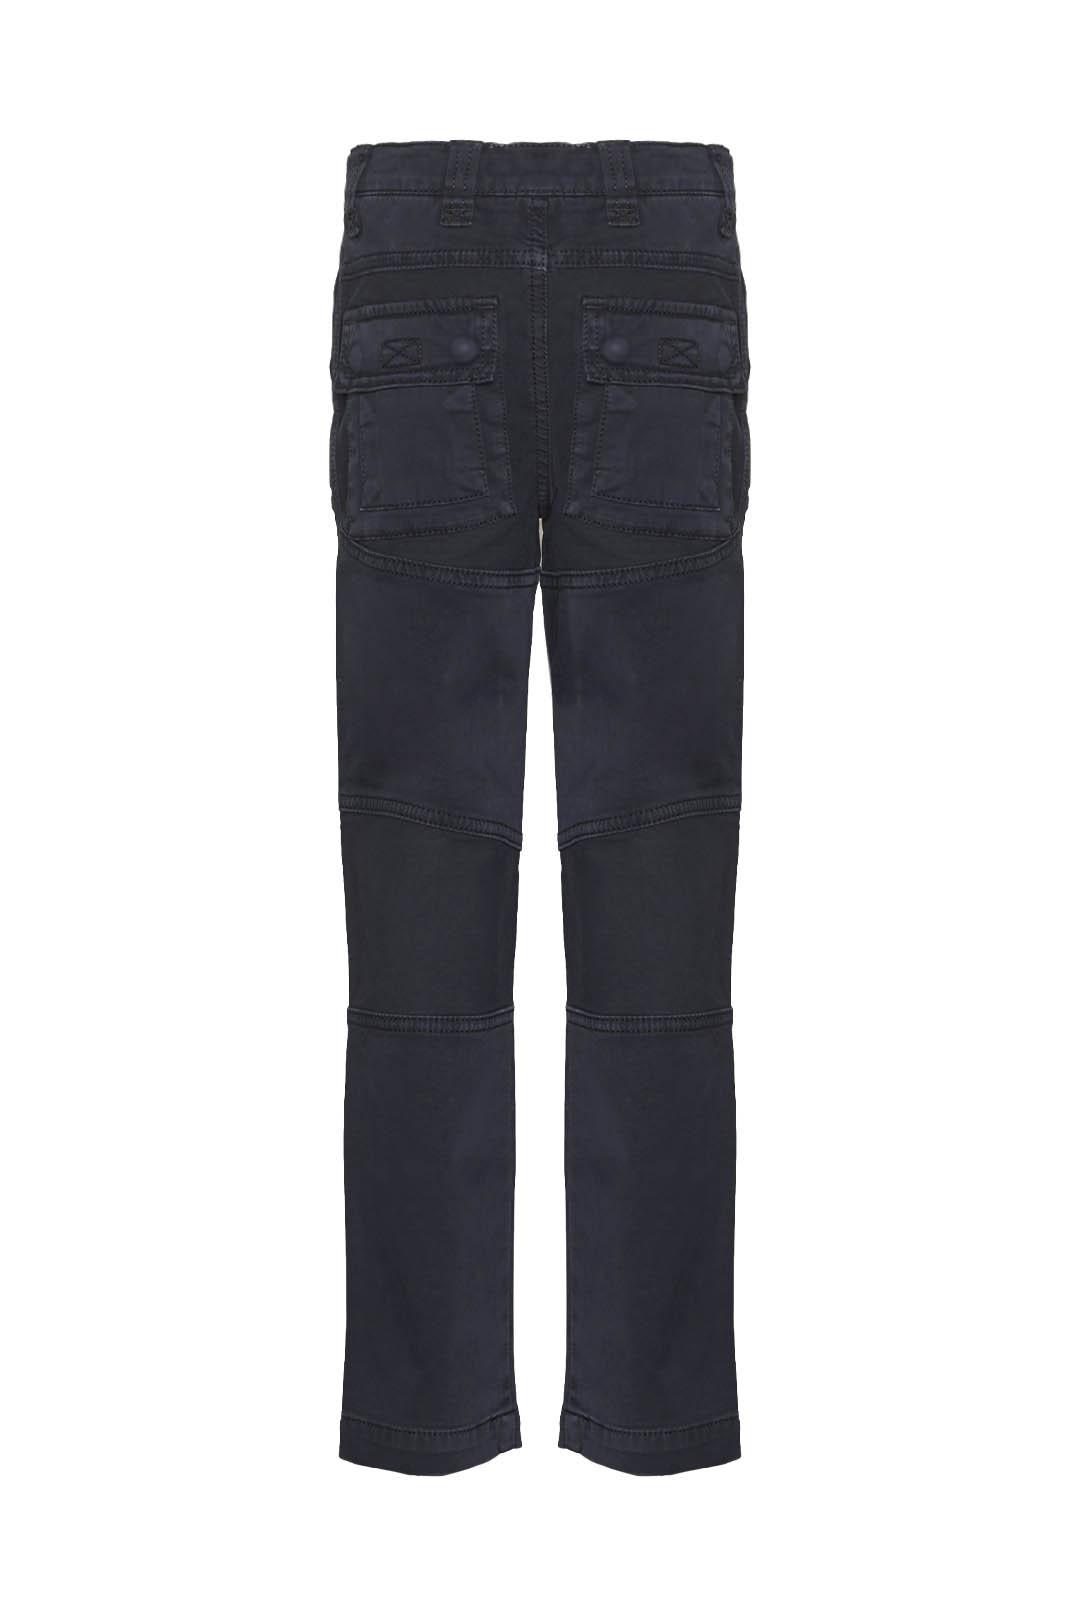 Iconico pantalone Anti-G                 2